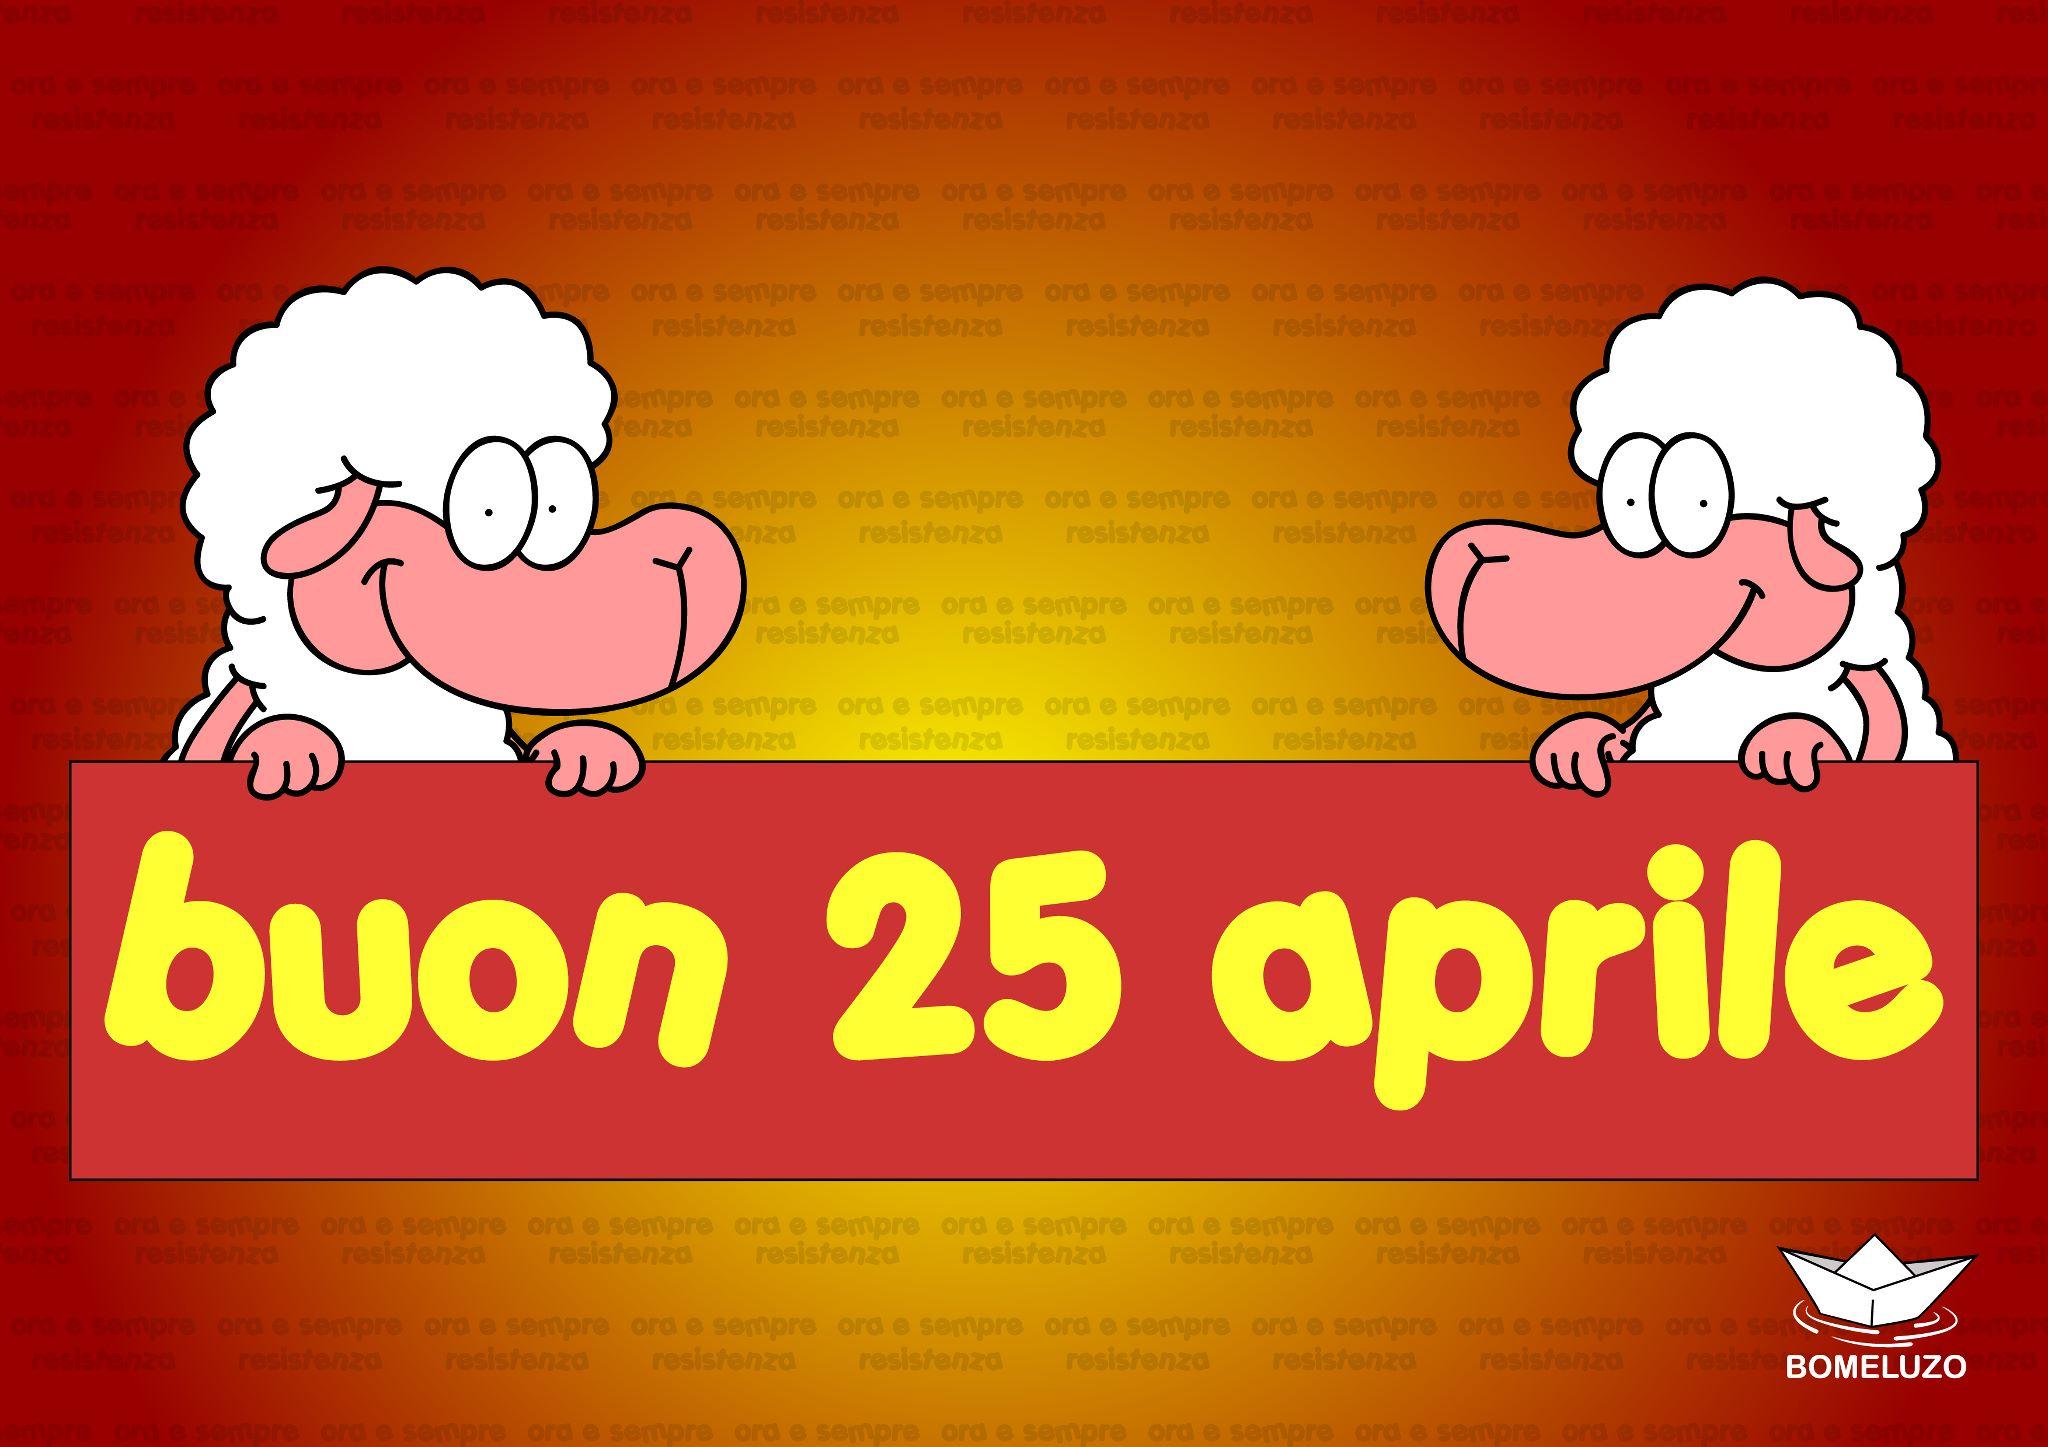 buon 25 aprile - photo #31